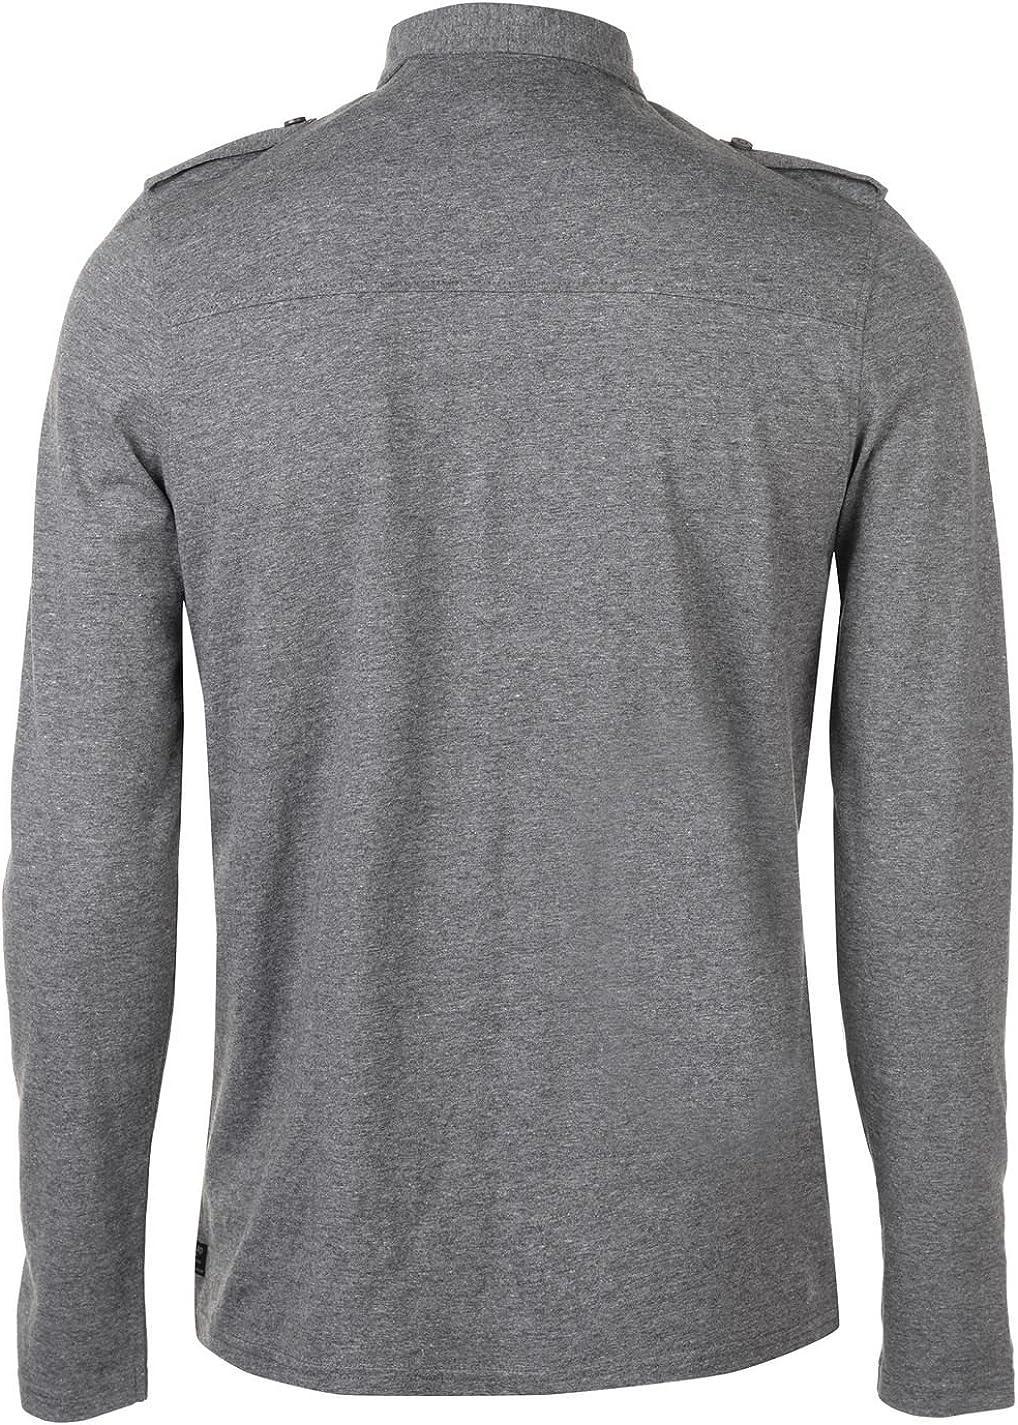 Firetrap Hombre Pocket Camisa Polo Manga Larga: Amazon.es: Ropa y ...